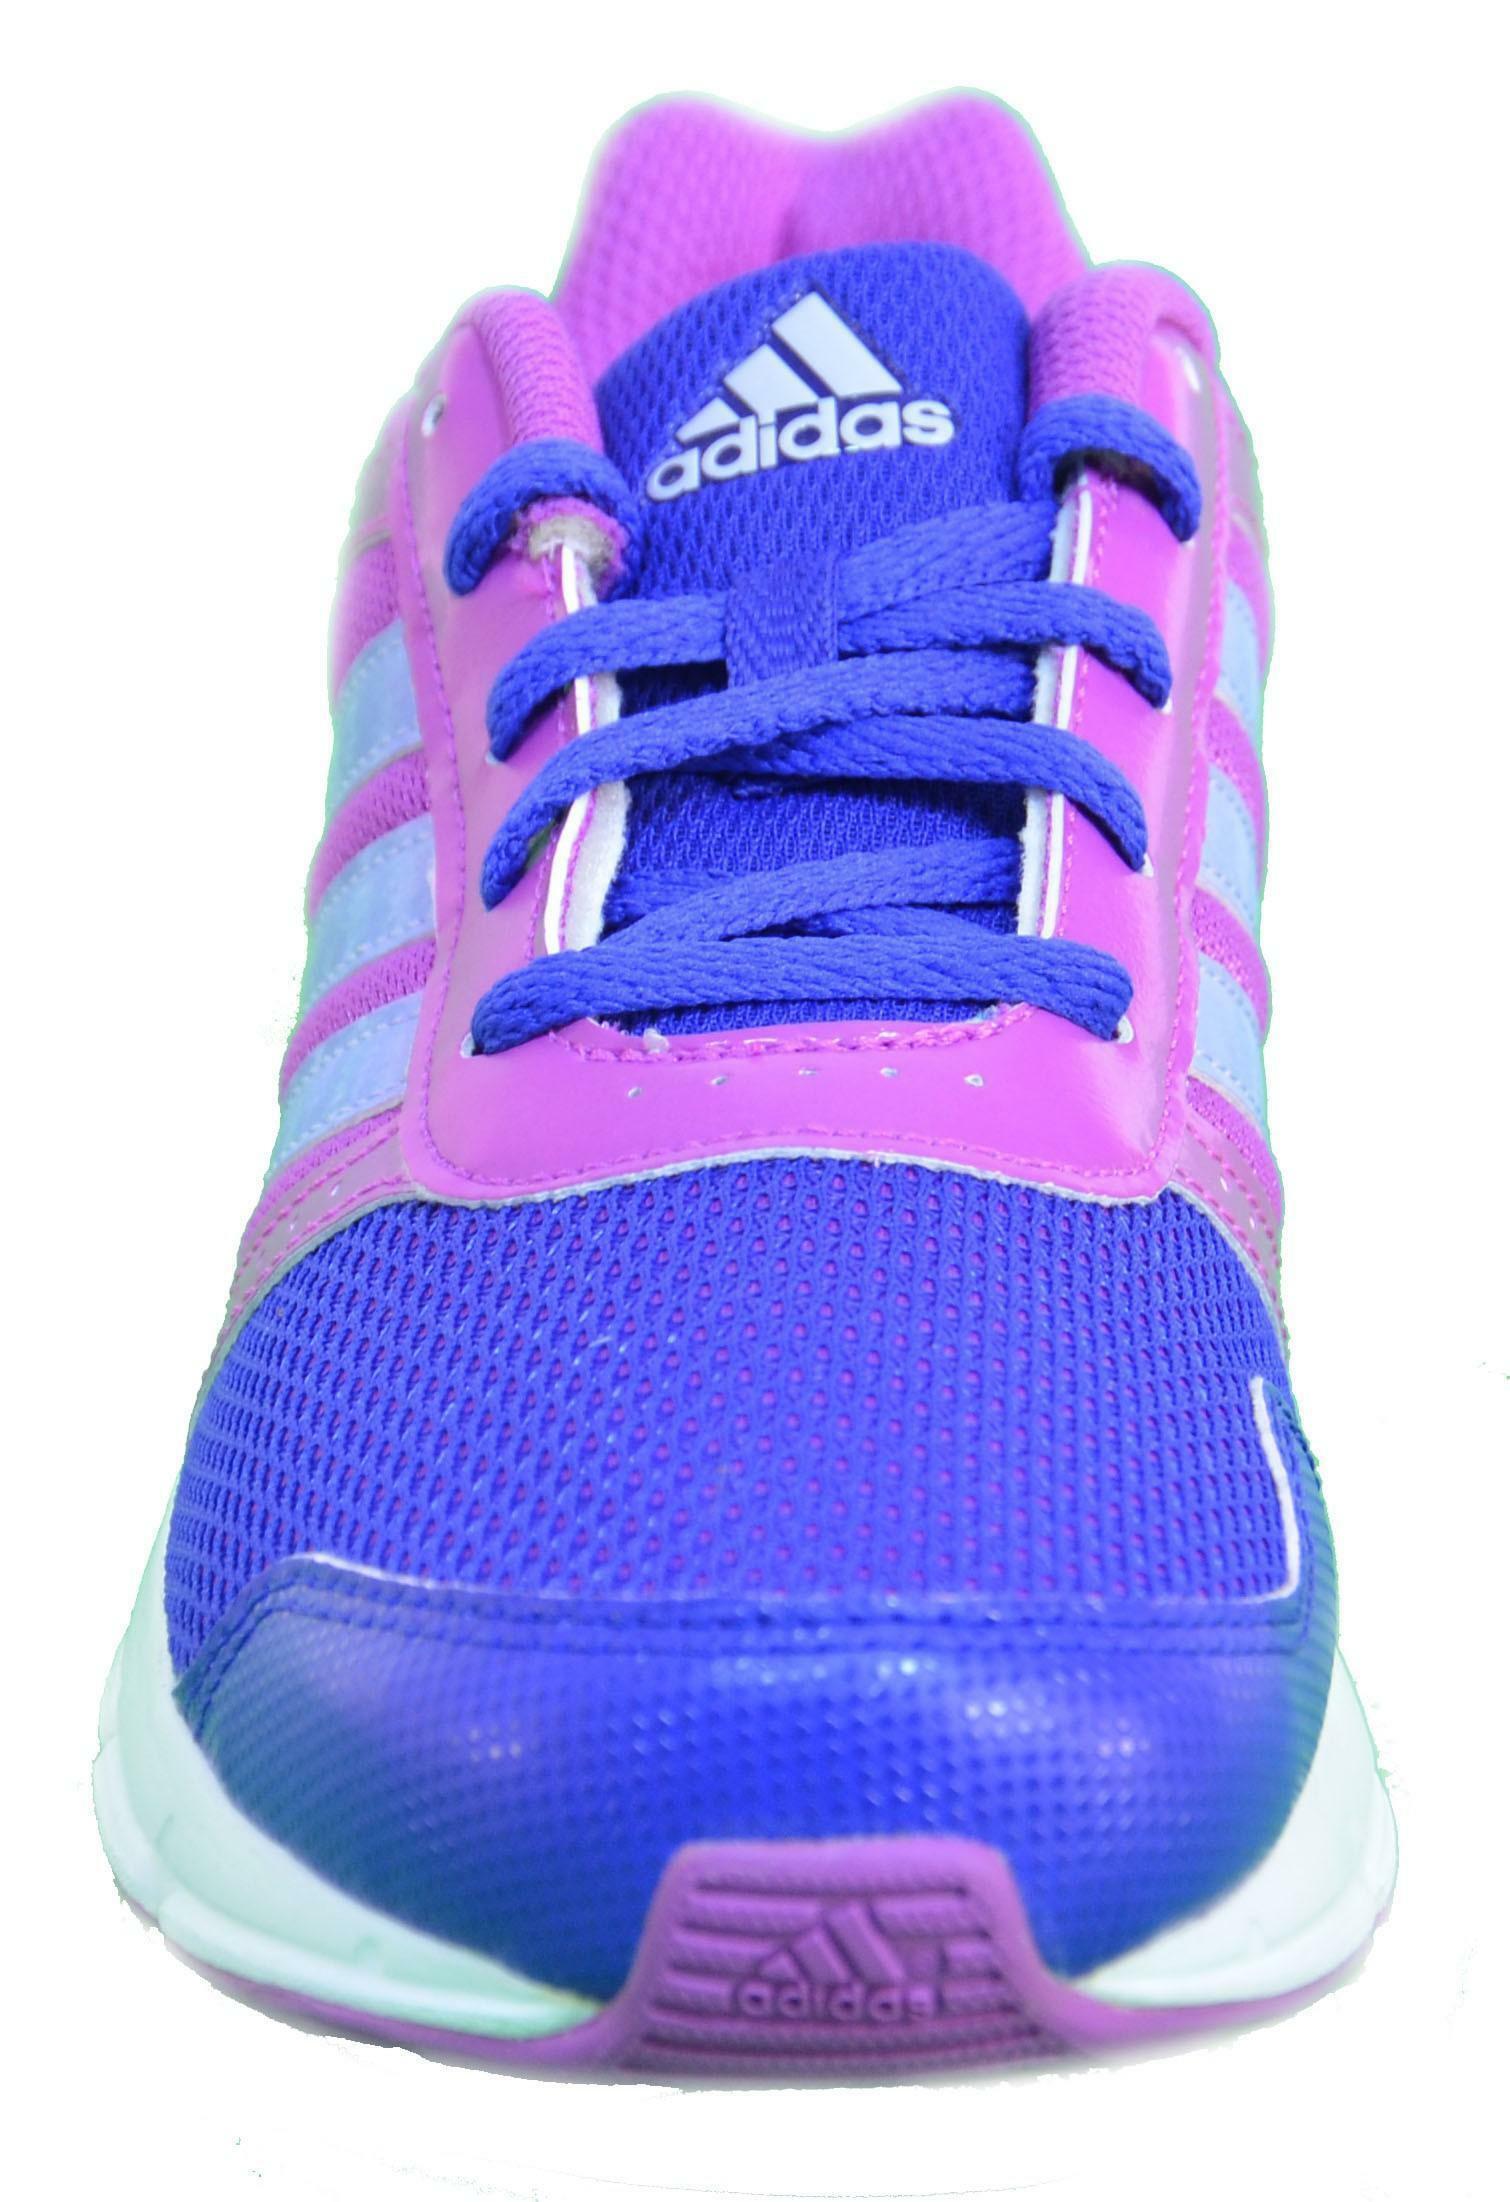 adidas adidas hyperfast k scarpe donna viola pelle tela b44128